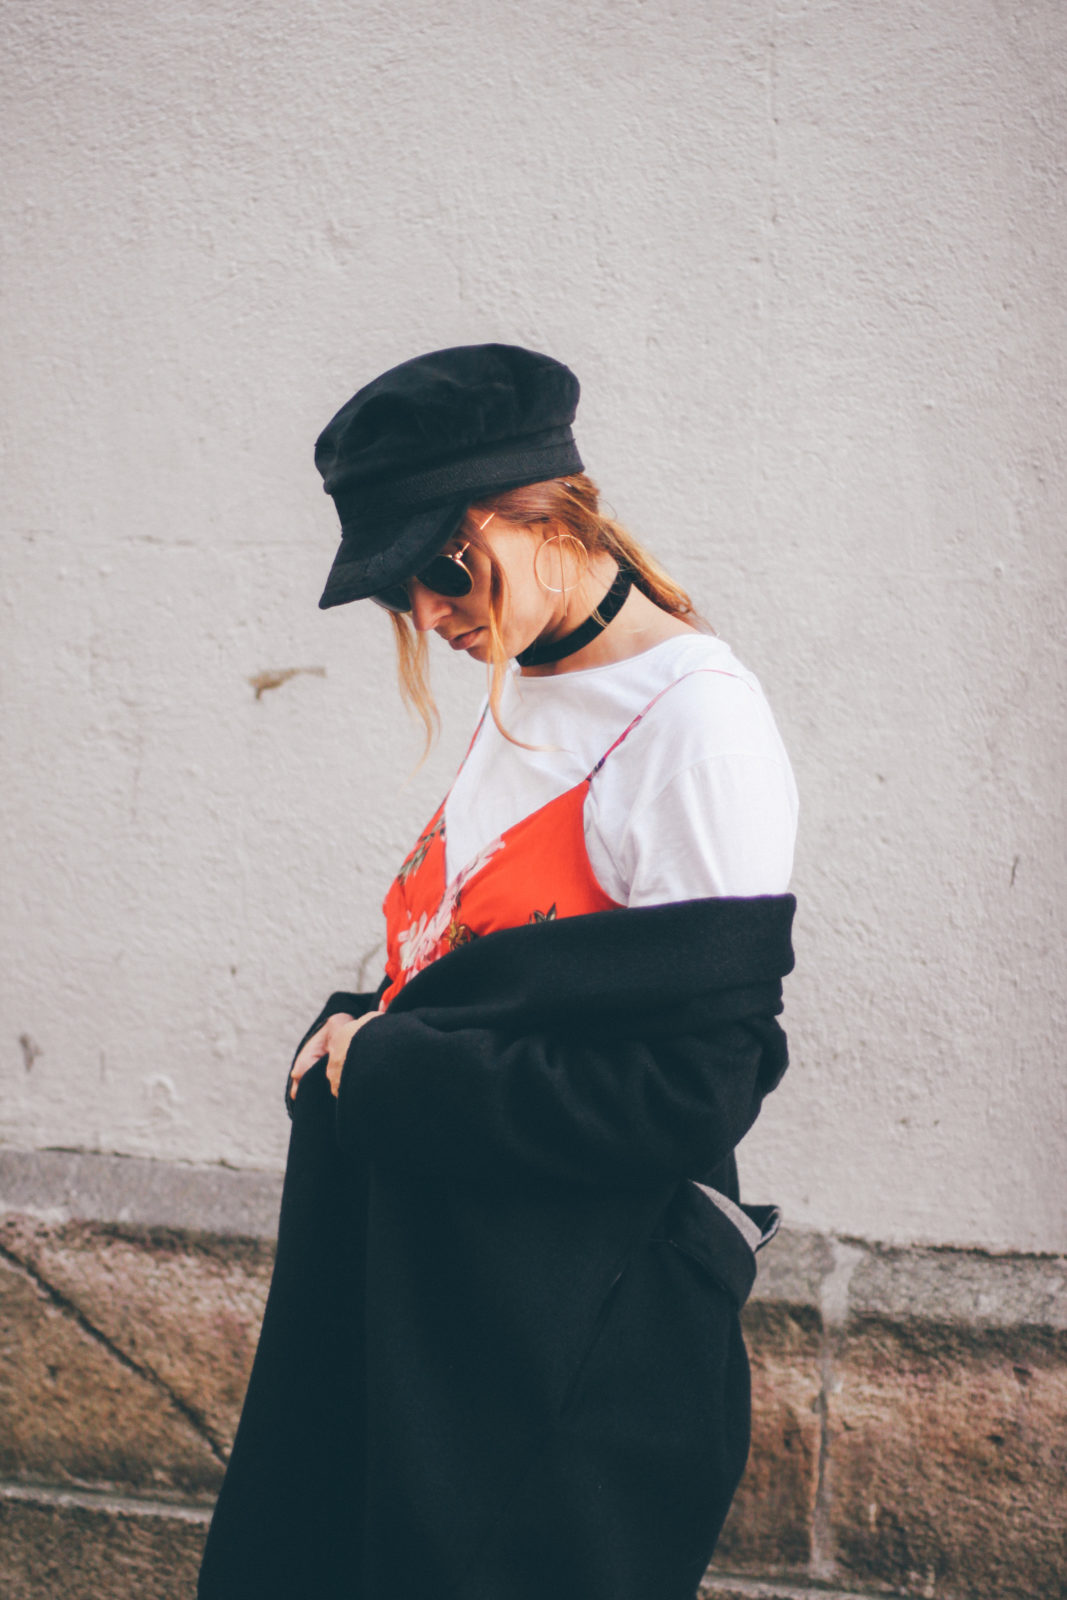 baker_boy_hat_vestido_con_camiseta_gorra_marinera_botines_hebillas_fall_2016_trends_street_style_outfits_donkeycool-30